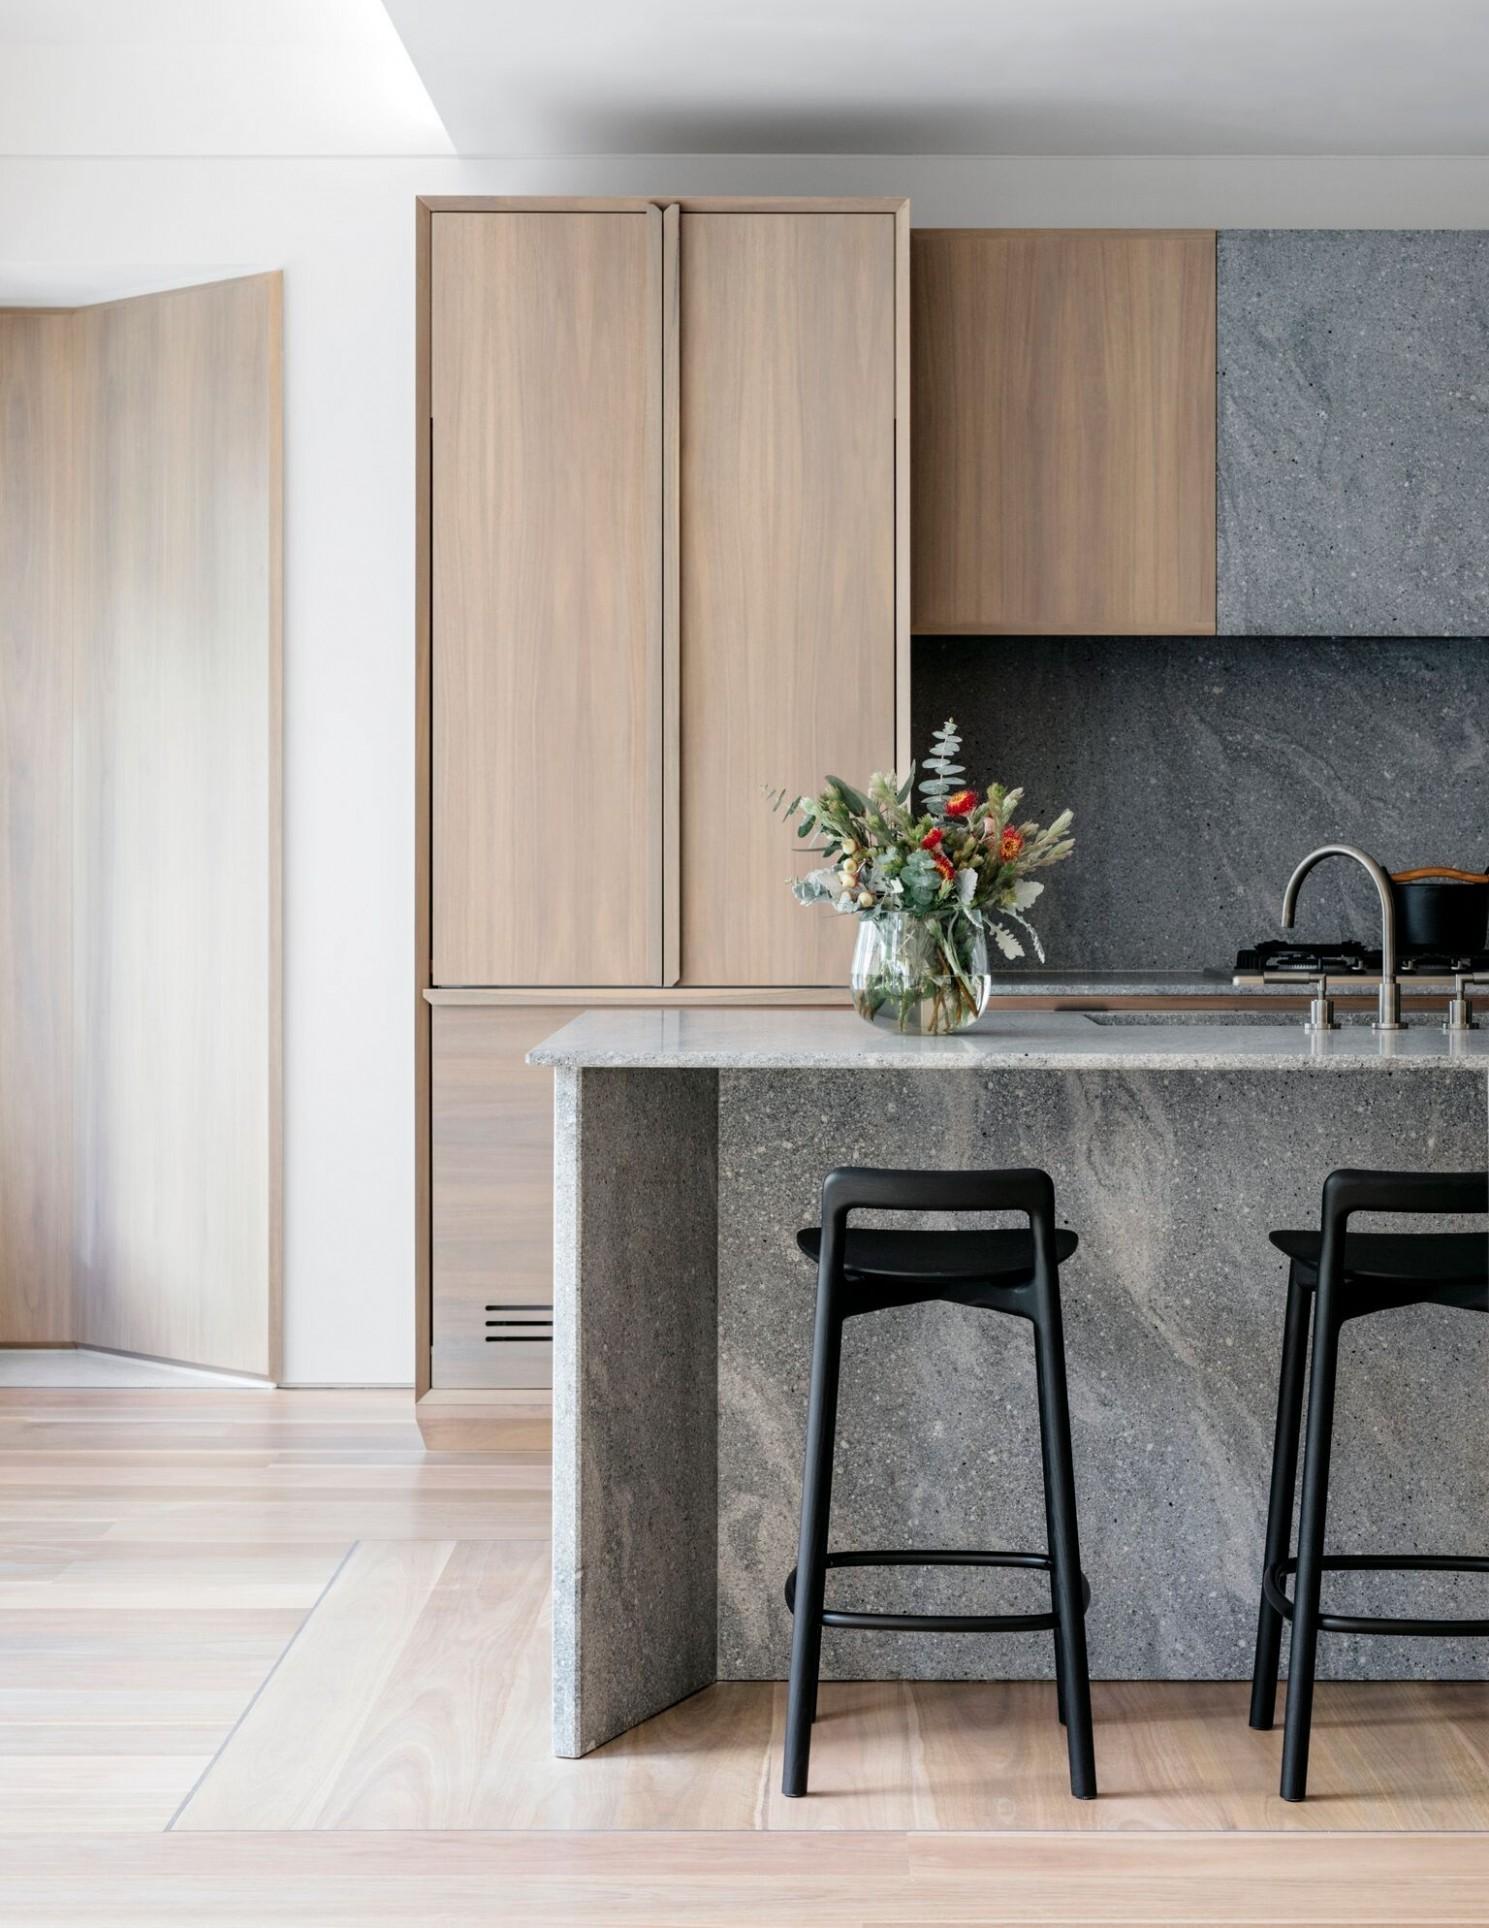 Loftus Lane Sydney Our Paradiso kitchen scheme for this boutique  - Apartment Kitchen Design Sydney